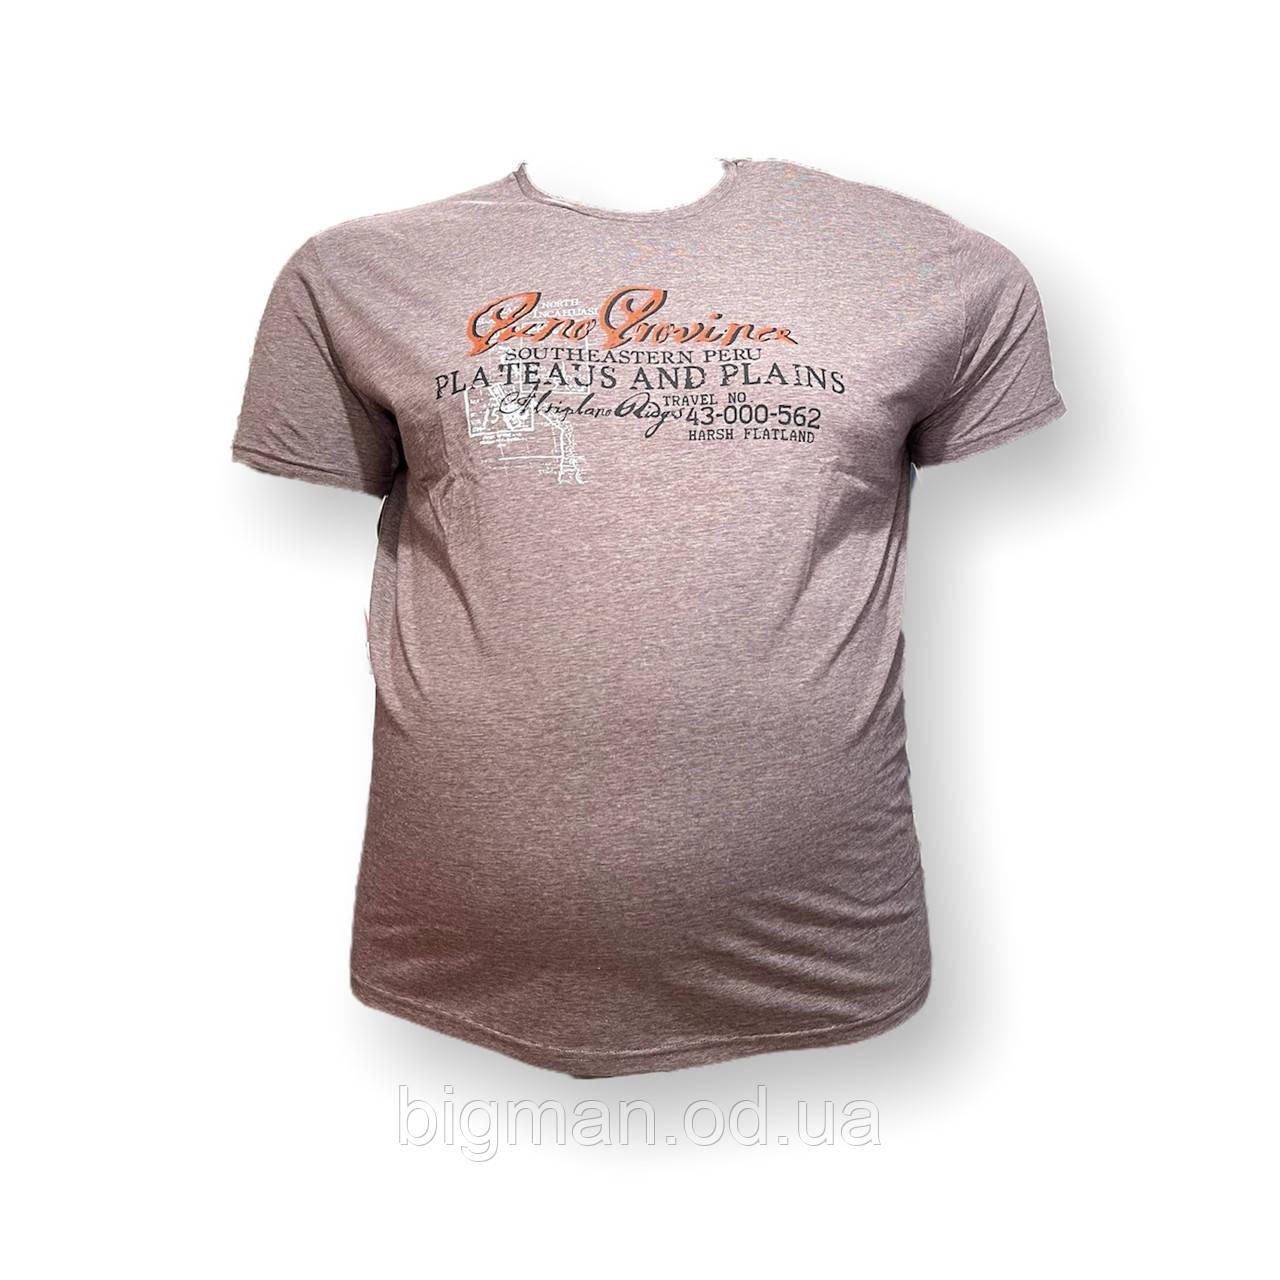 Мужская батальная футболка Monte Carlo 12091 3XL 4XL 5XL 6XL 7XL розовый большие размеры Турция